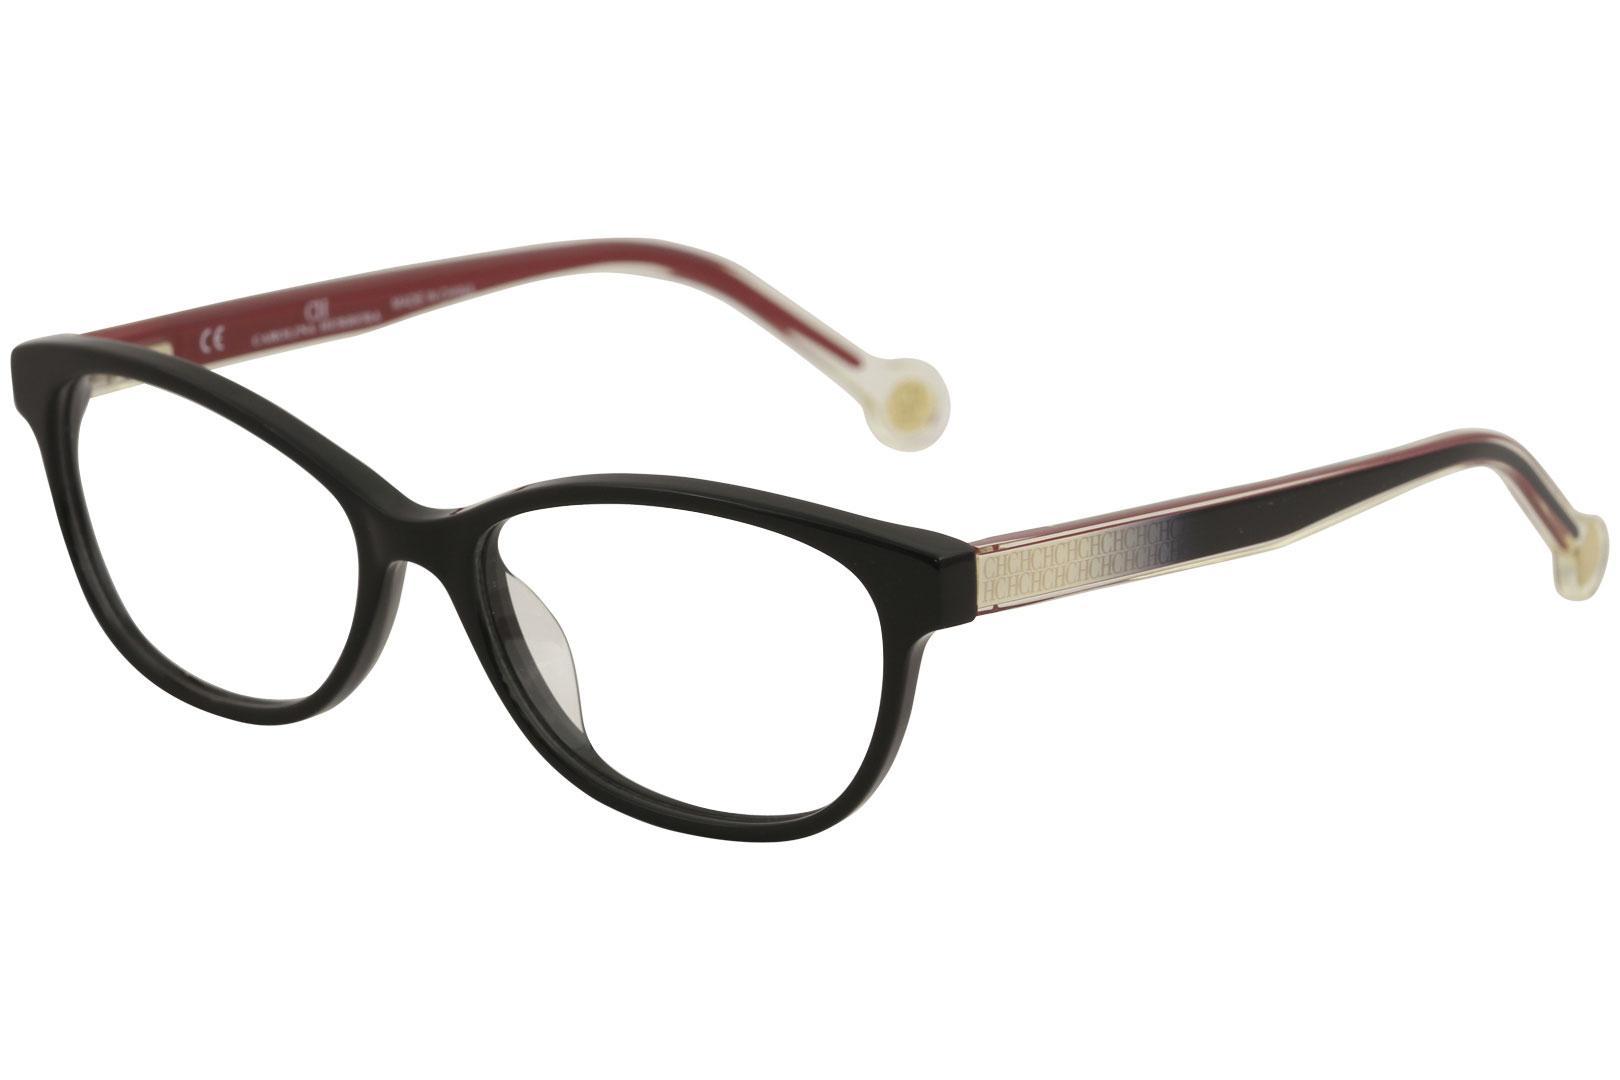 5d18cdabb4 CH Carolina Herrera Women s Eyeglasses VHE726K VHE 726 K Full Rim ...